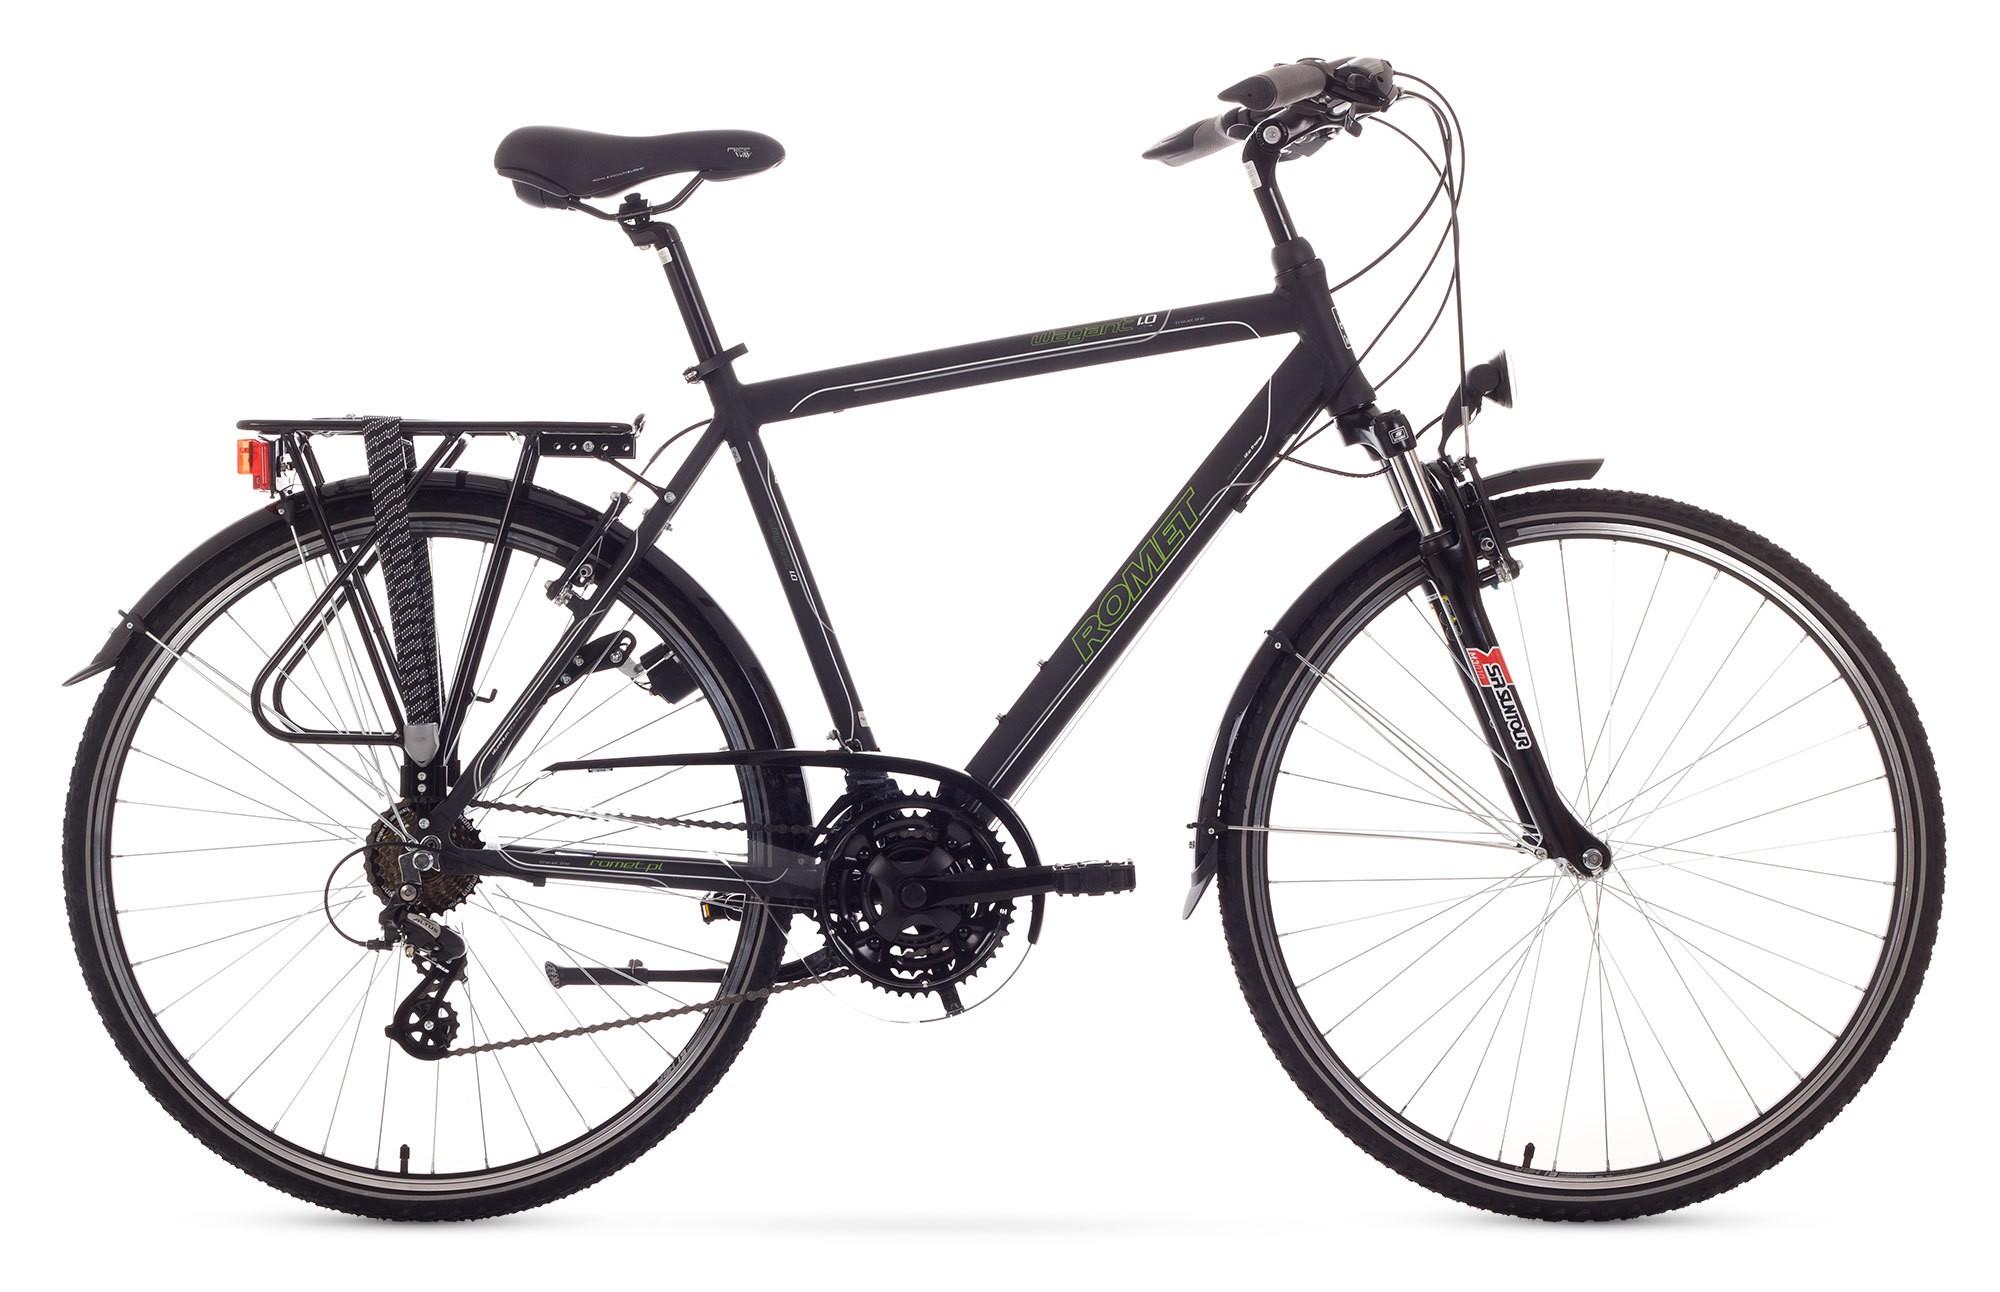 Bicicleta Trekking Romet Wagant 1.0 - negru